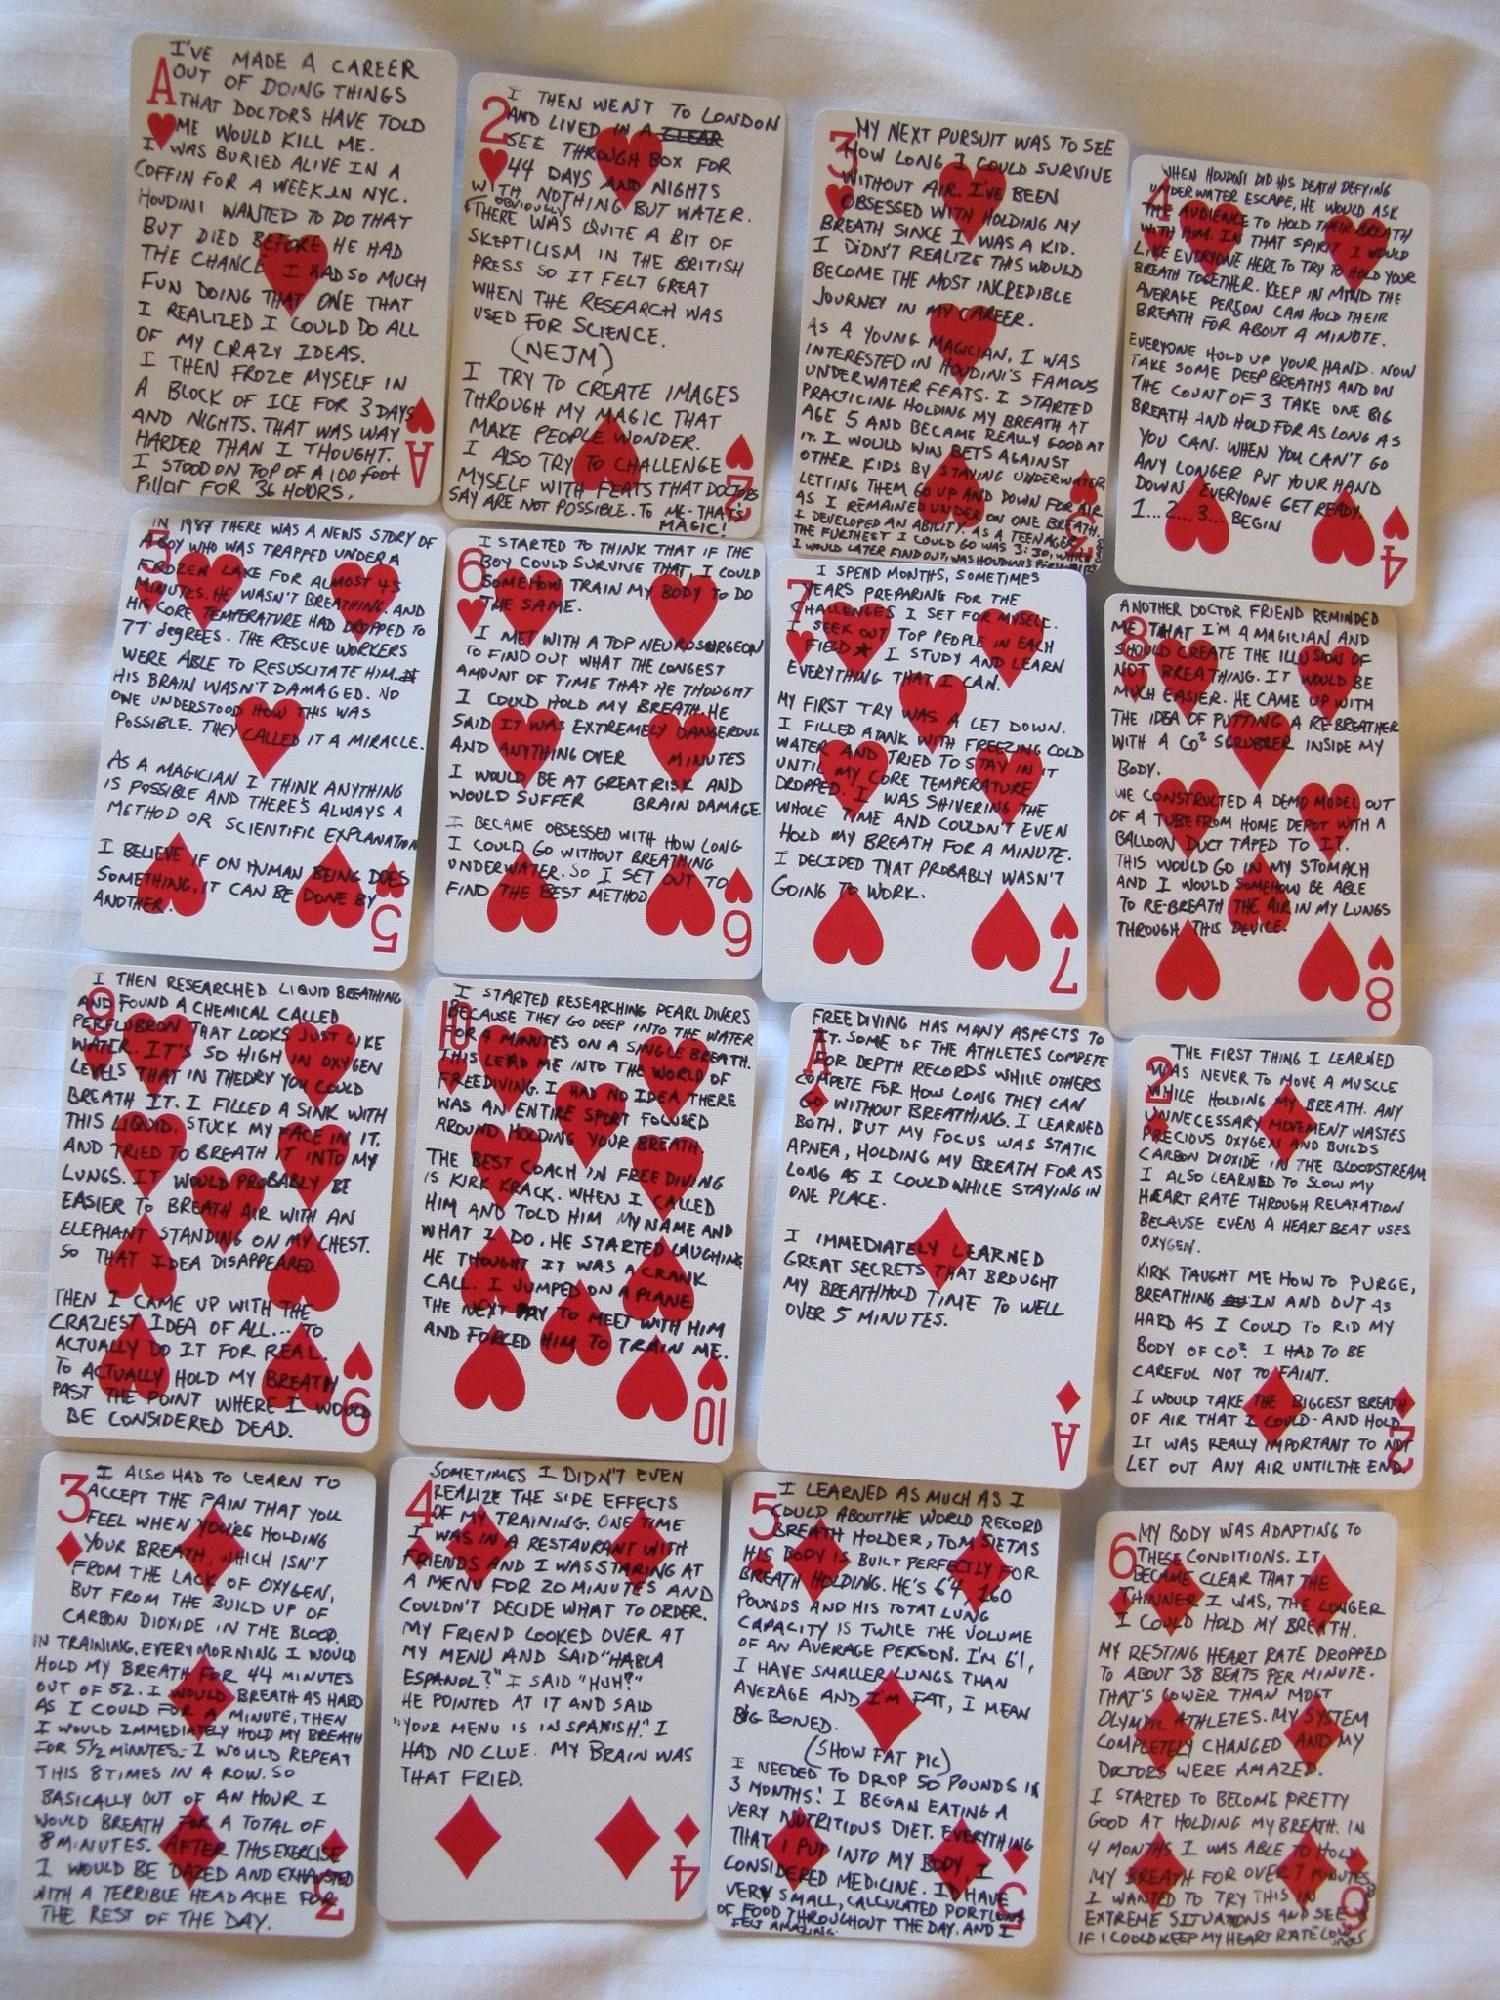 2013-06-07-cards.jpg